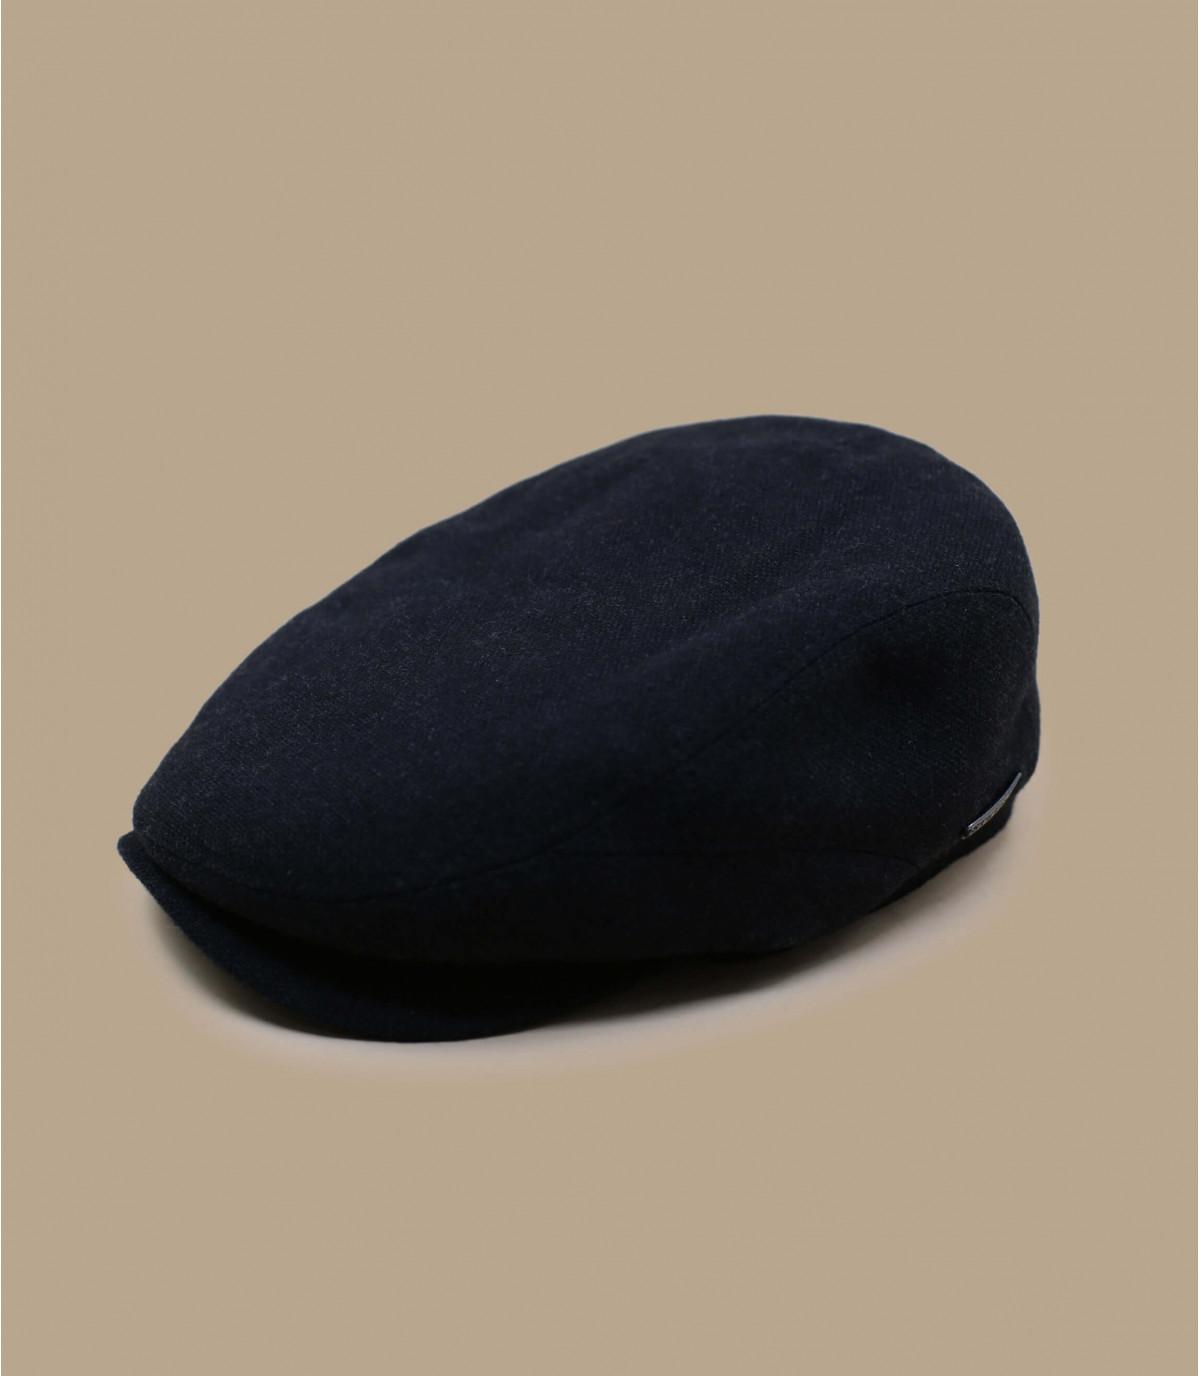 Détails Belfast Virgin Wool Cashmere grey - image 2